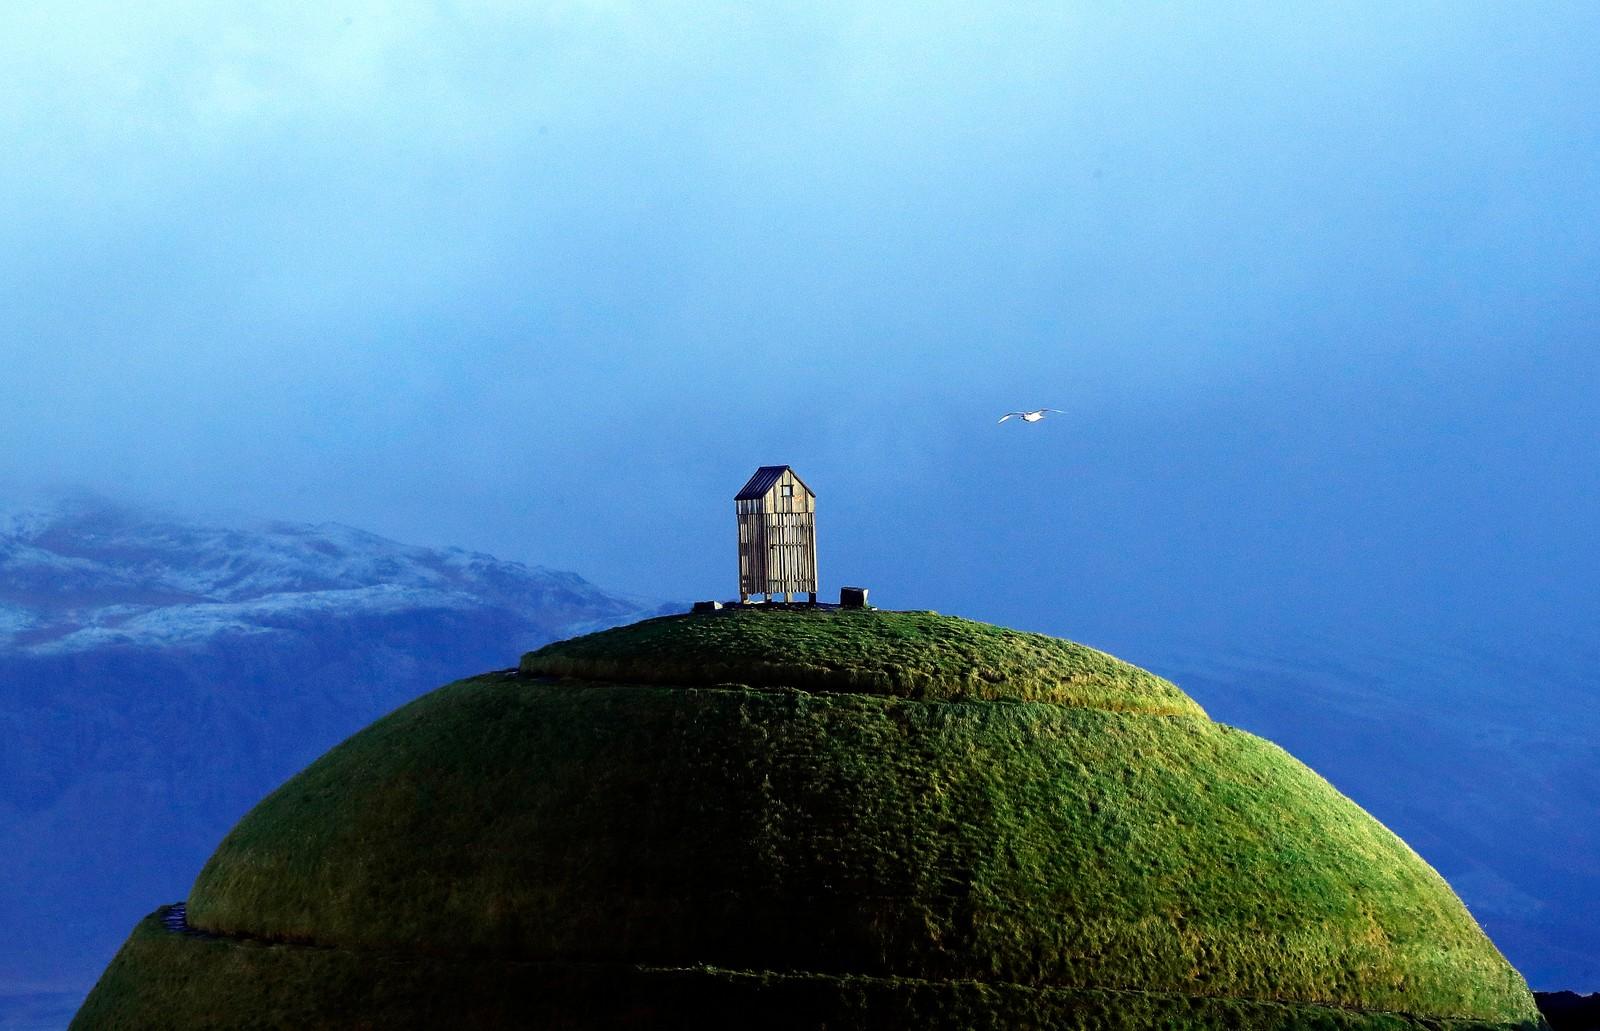 Turistattraksjonen Thufa på Island.